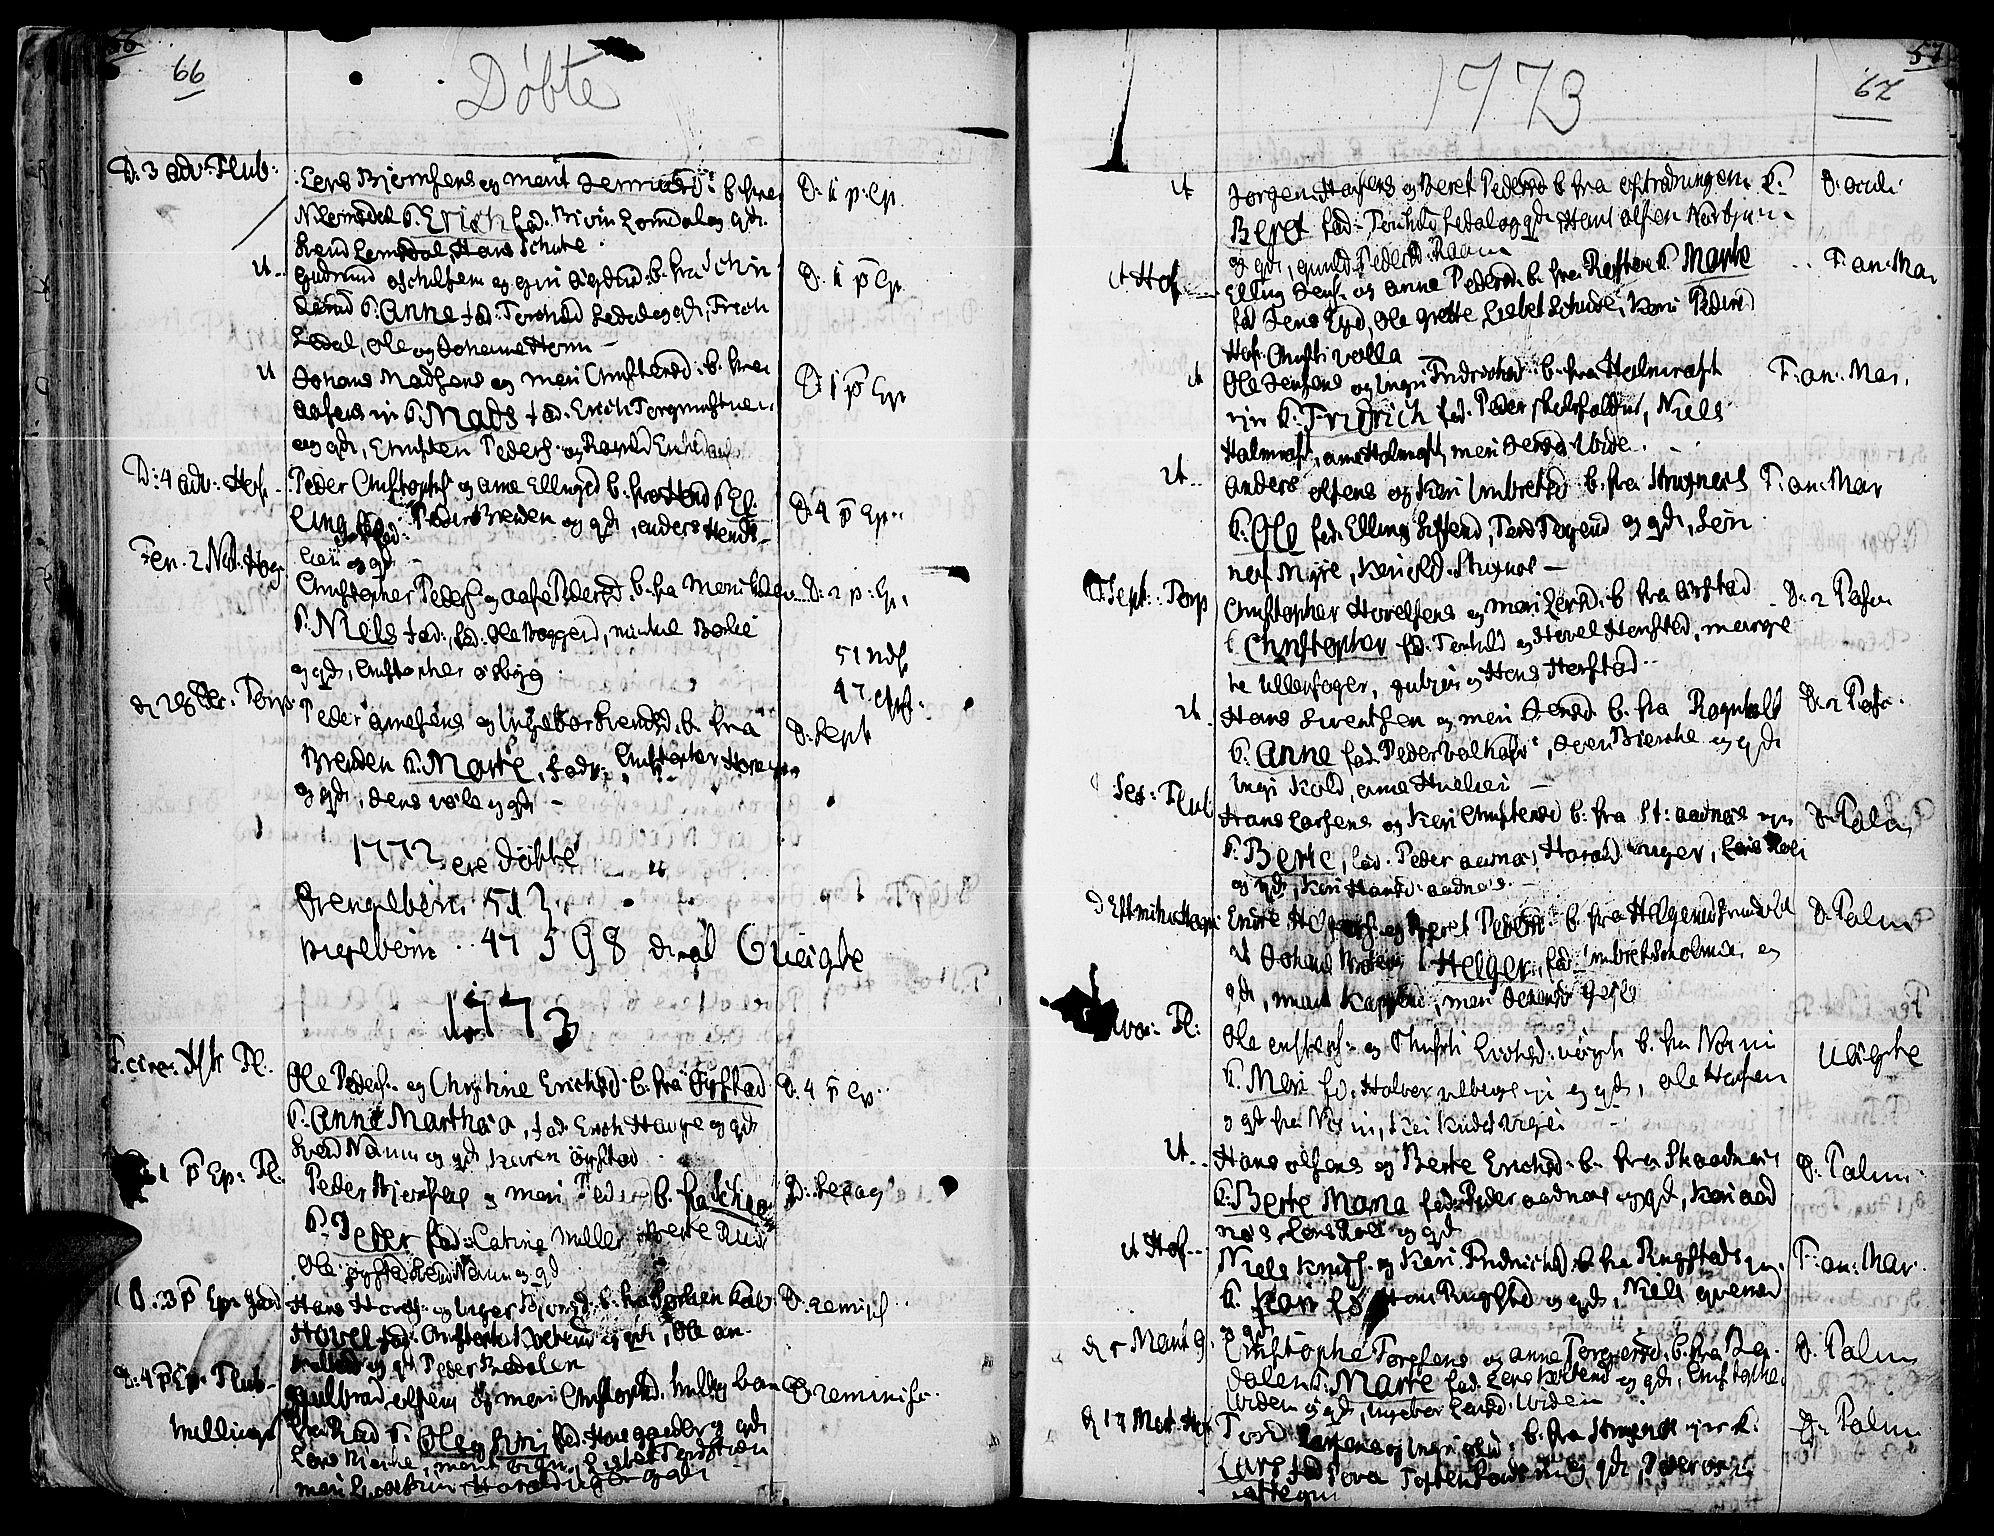 SAH, Land prestekontor, Ministerialbok nr. 5, 1765-1784, s. 66-67